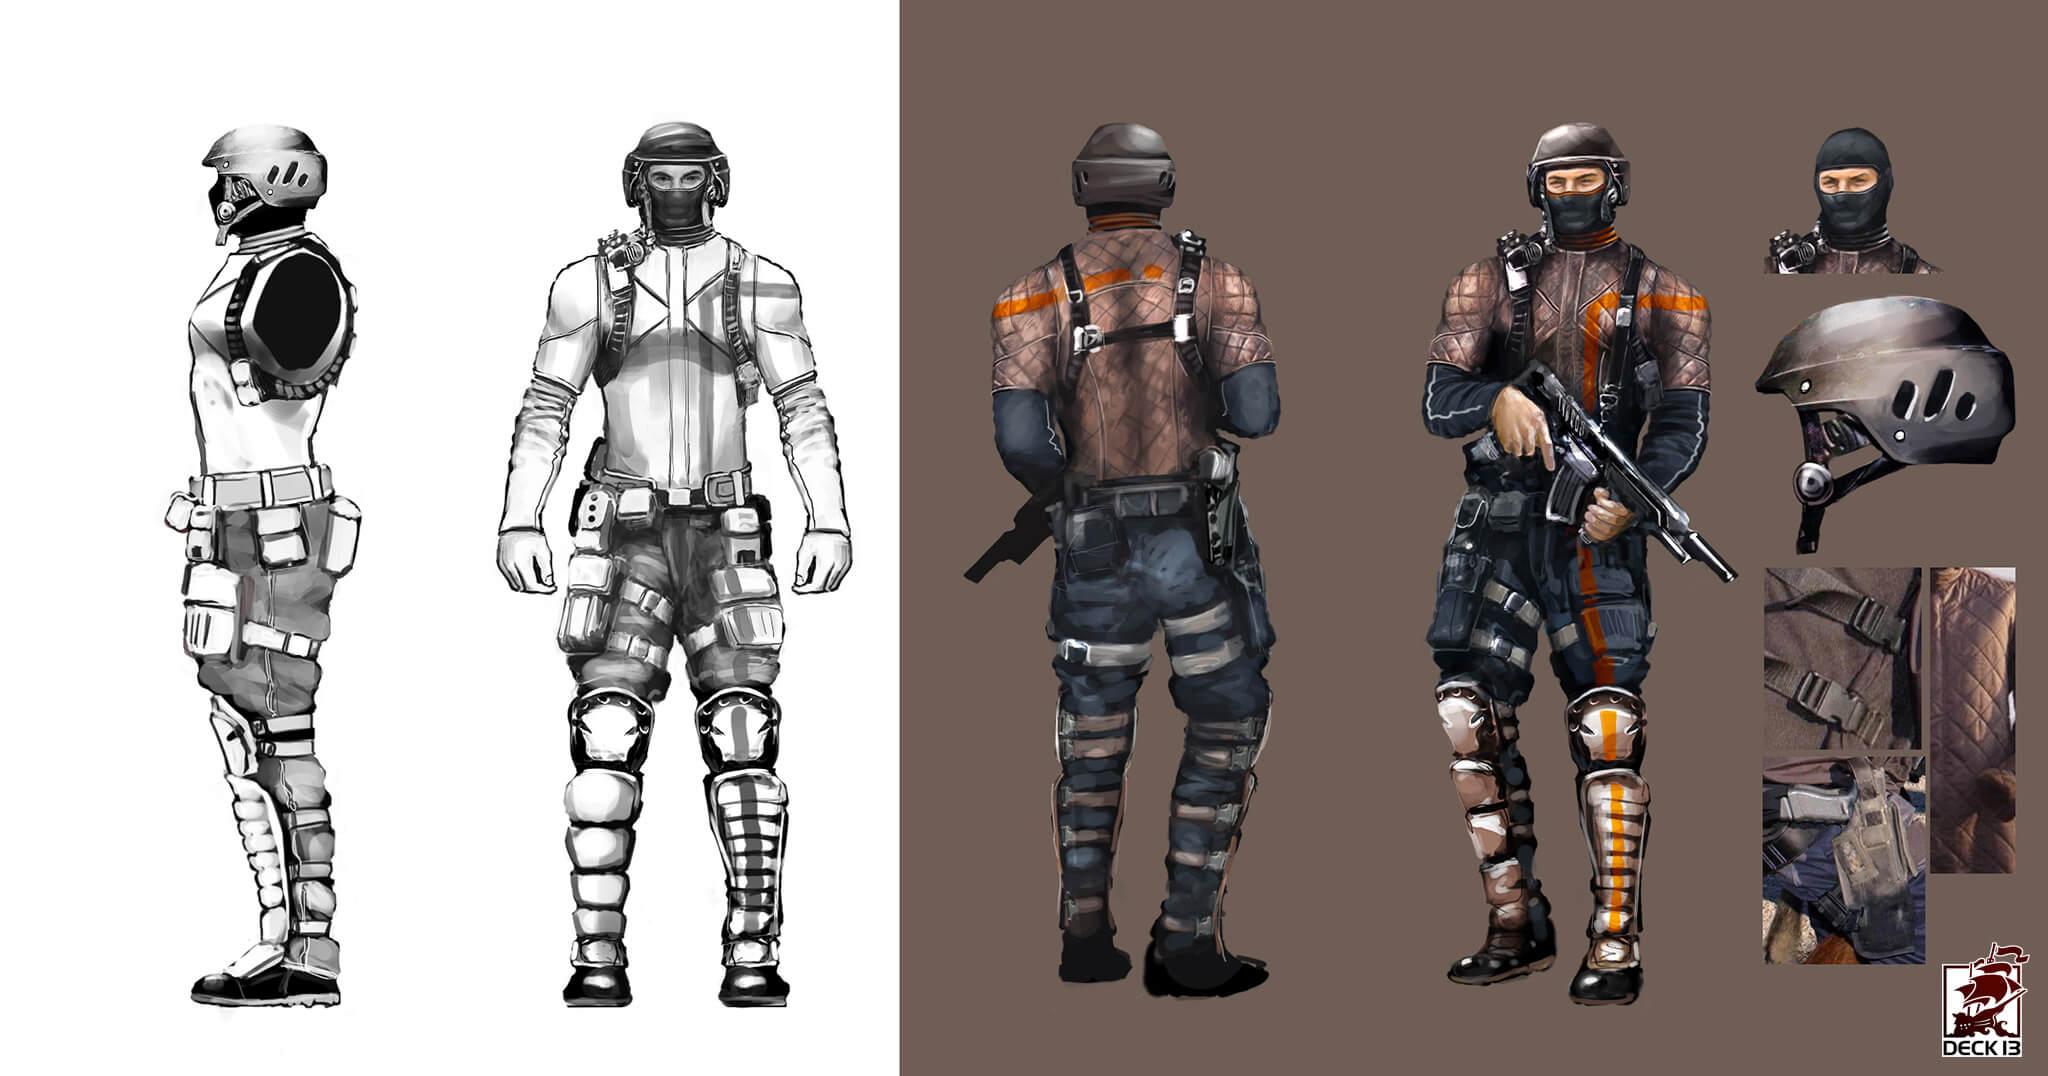 strain-deck13-character-concept-art-felix-botho-haas-guard1